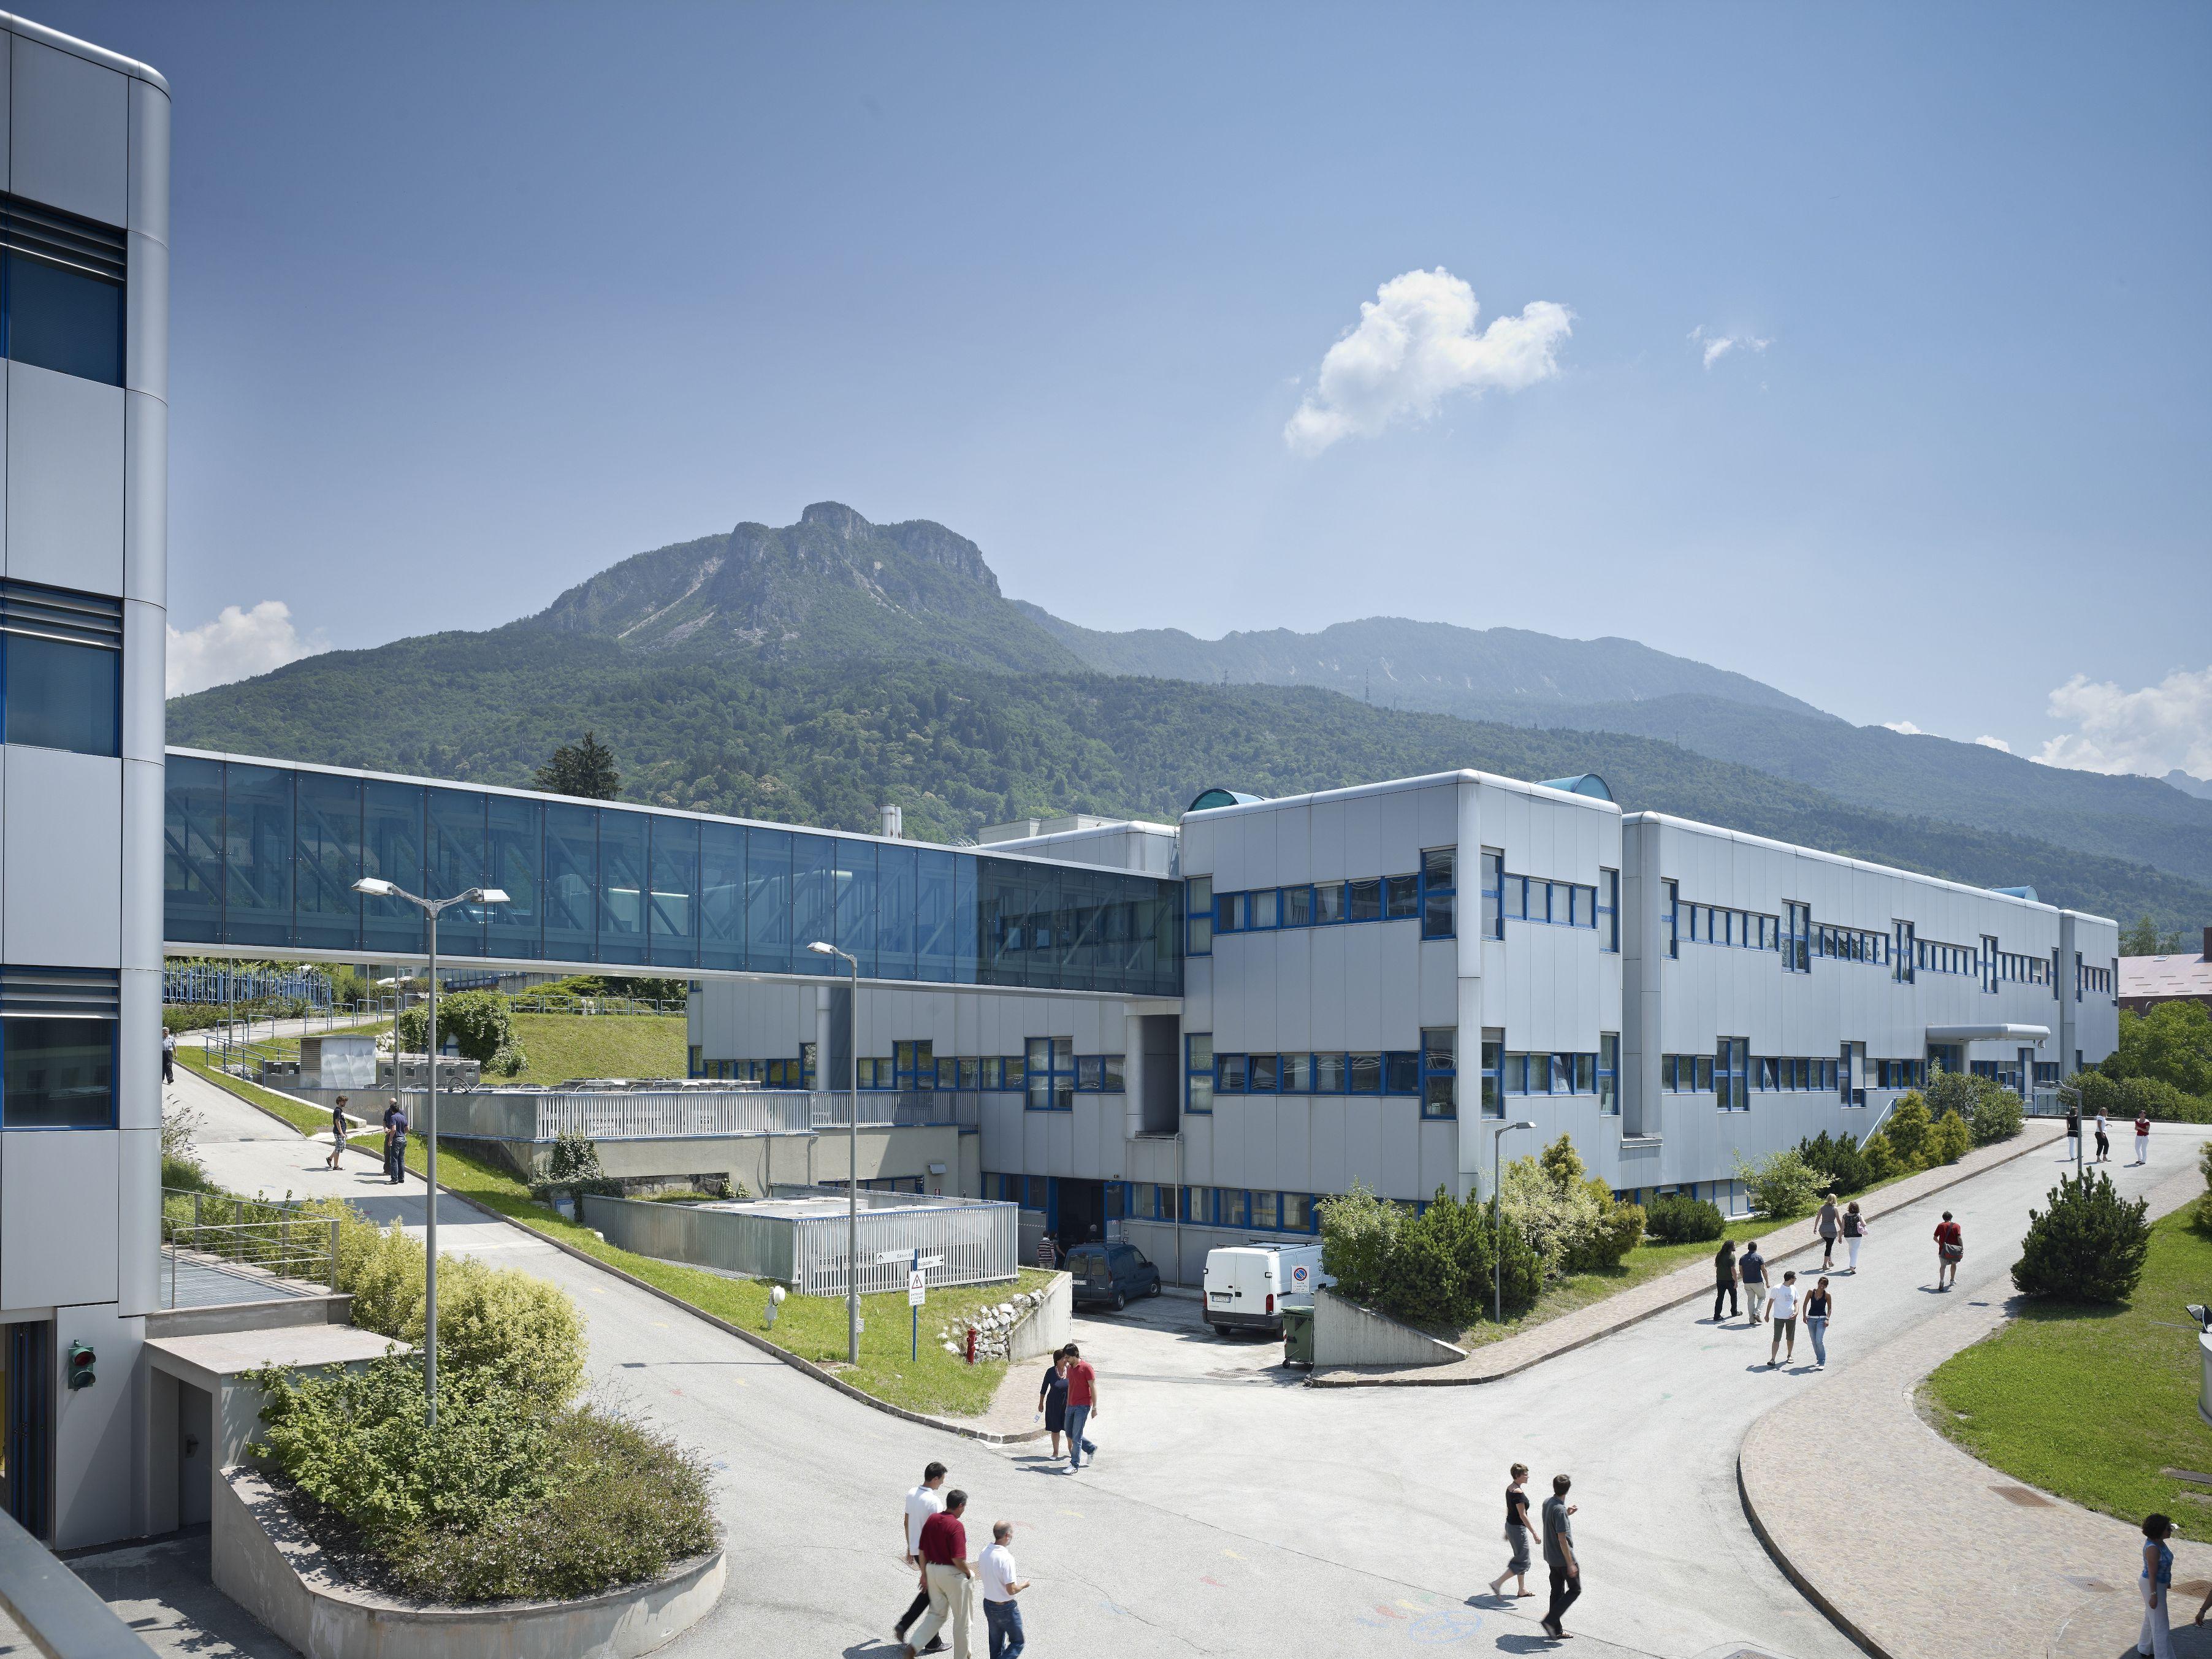 Sede della Fondazione Bruno Kessler (FBK) a Trento (website legacy.fbk.eu)